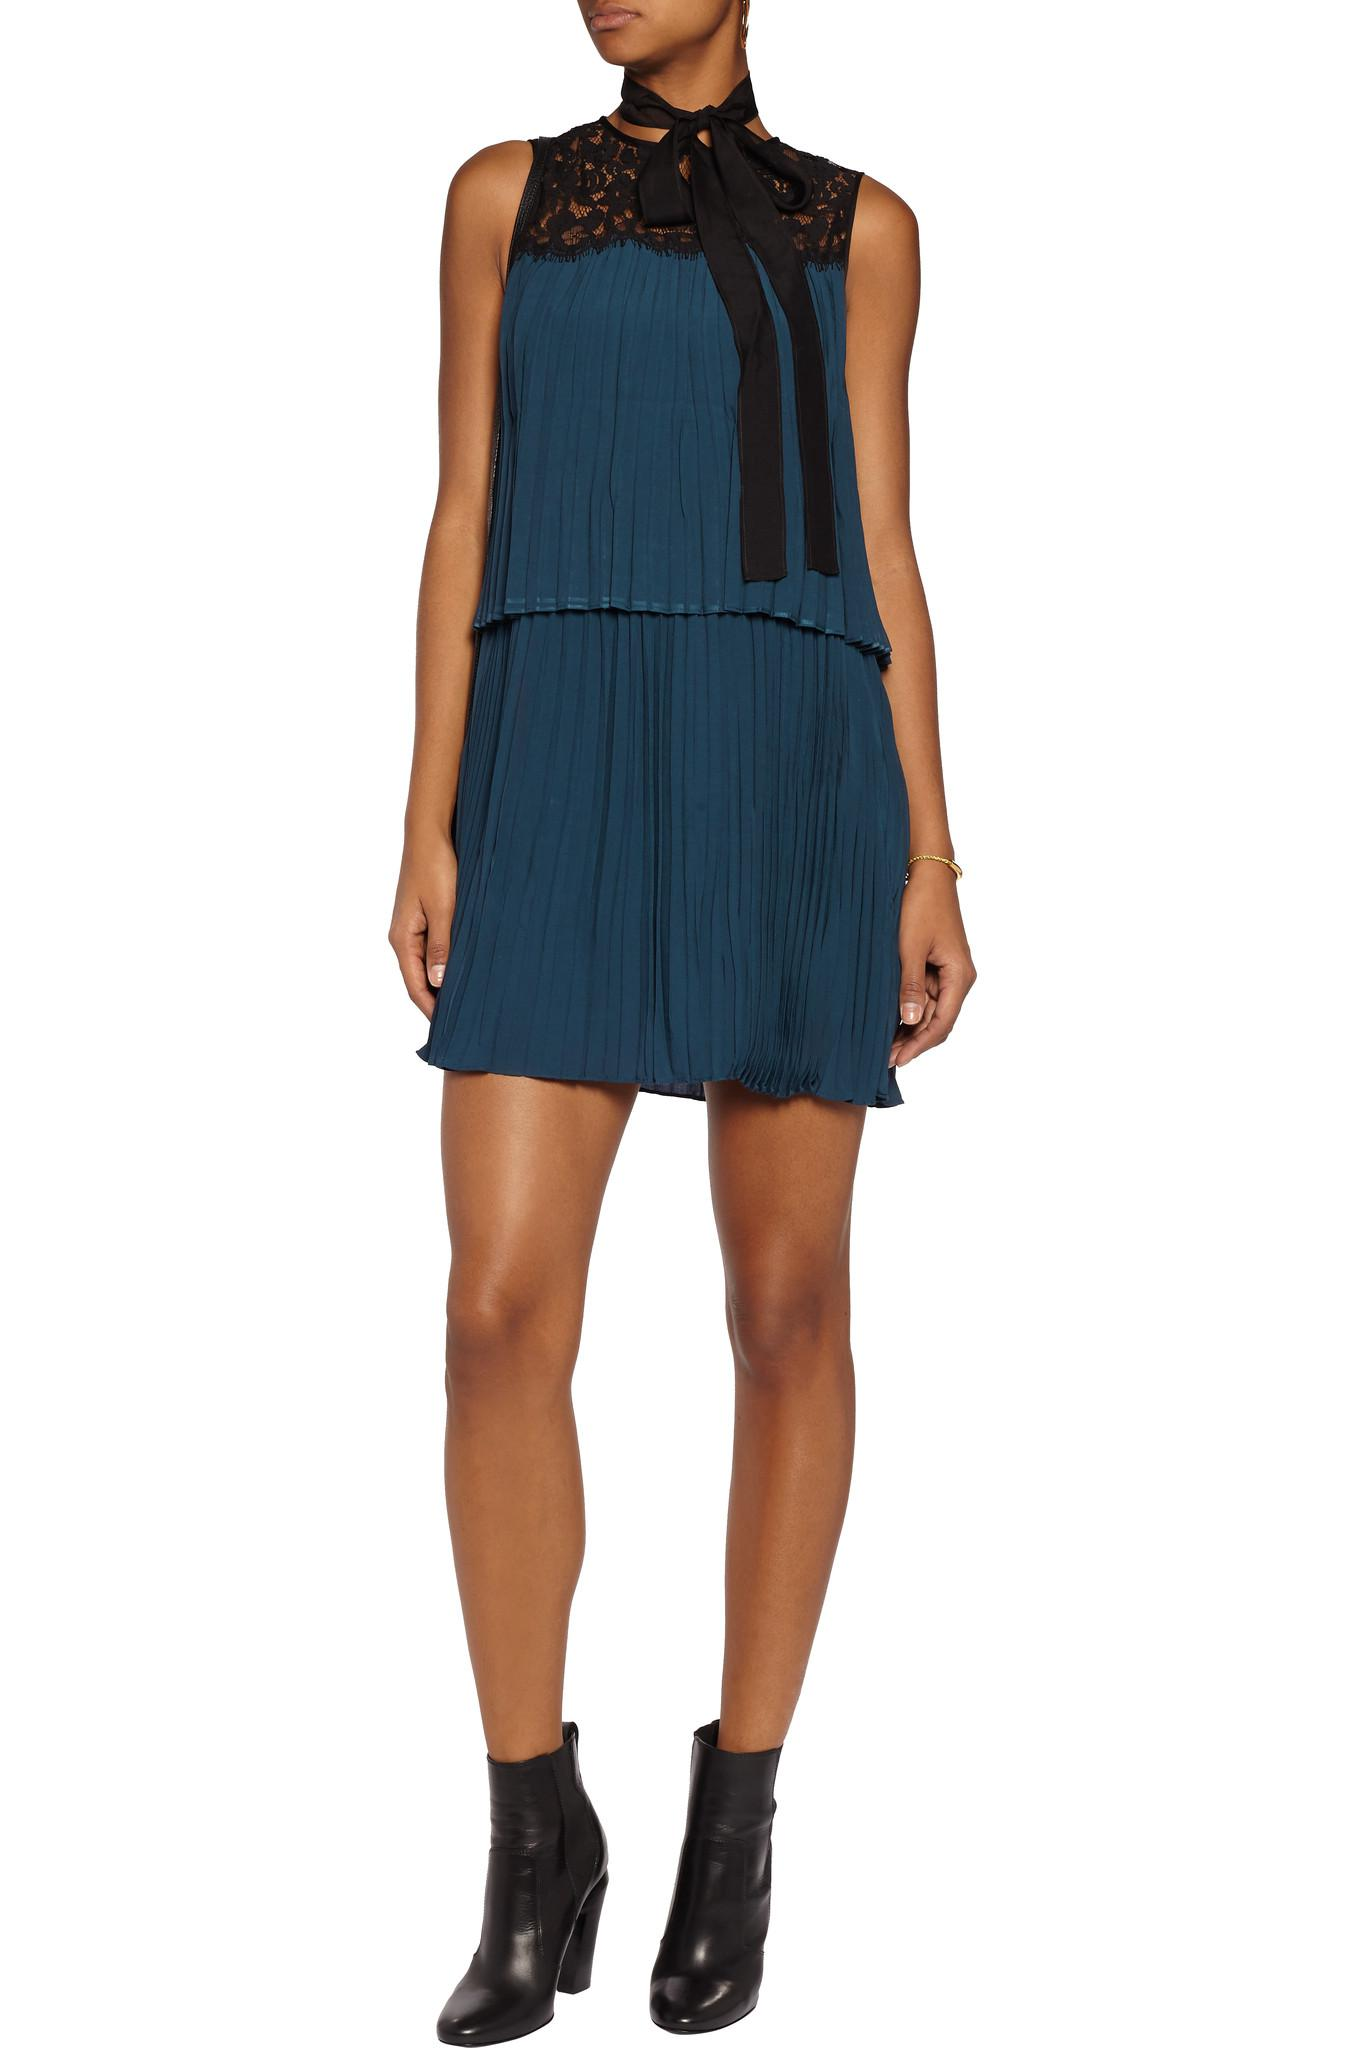 Rachel Zoe Berenice Lace Paneled Pleated Voile Mini Dress Storm Blue